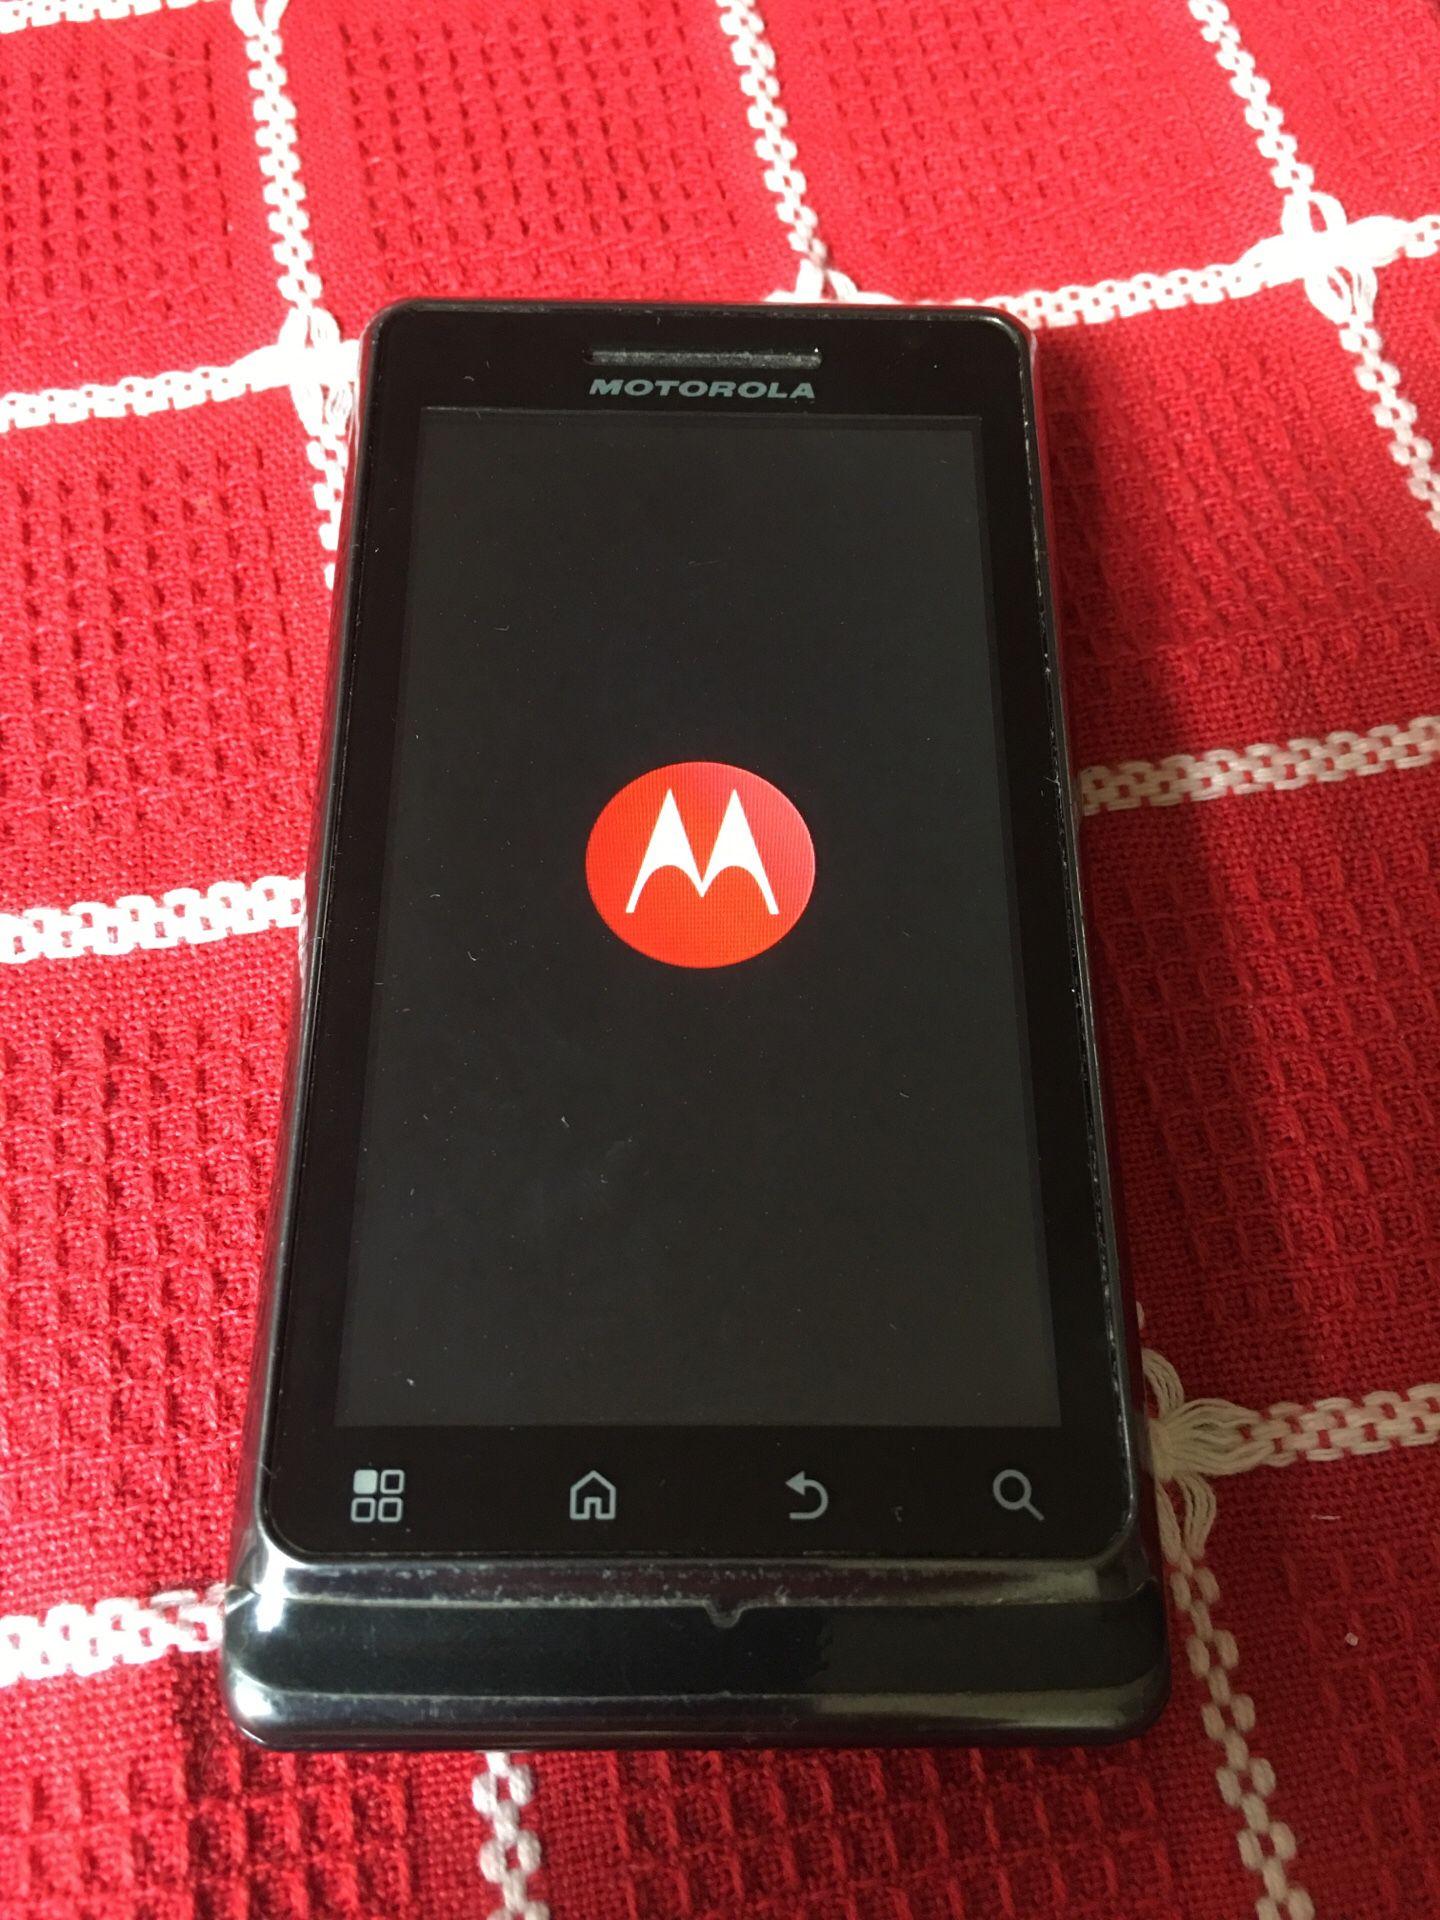 Motorola 4g android smartphones